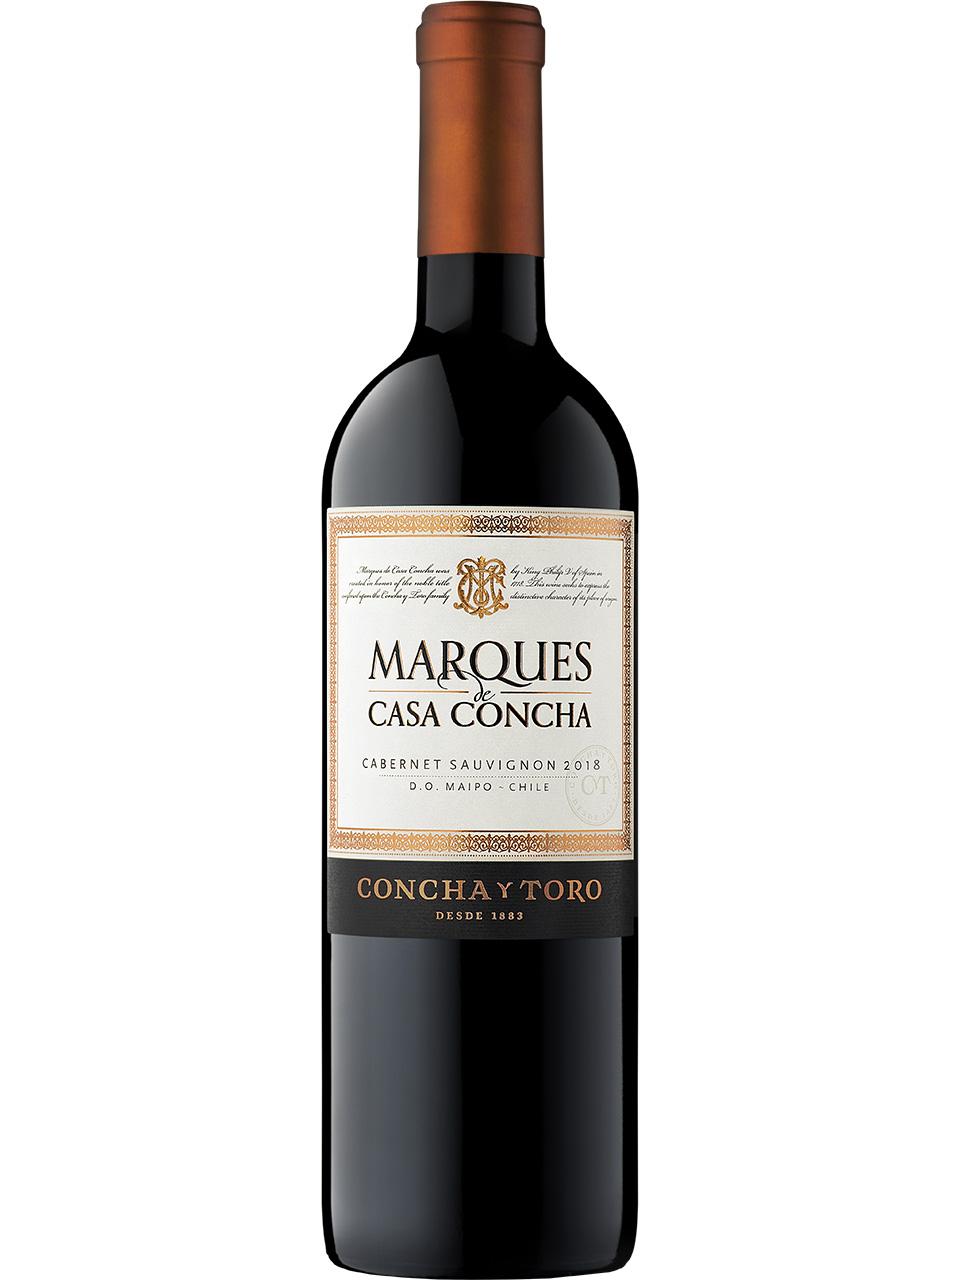 Concha y Toro Marques de Casa Concha Cabernet Sauv